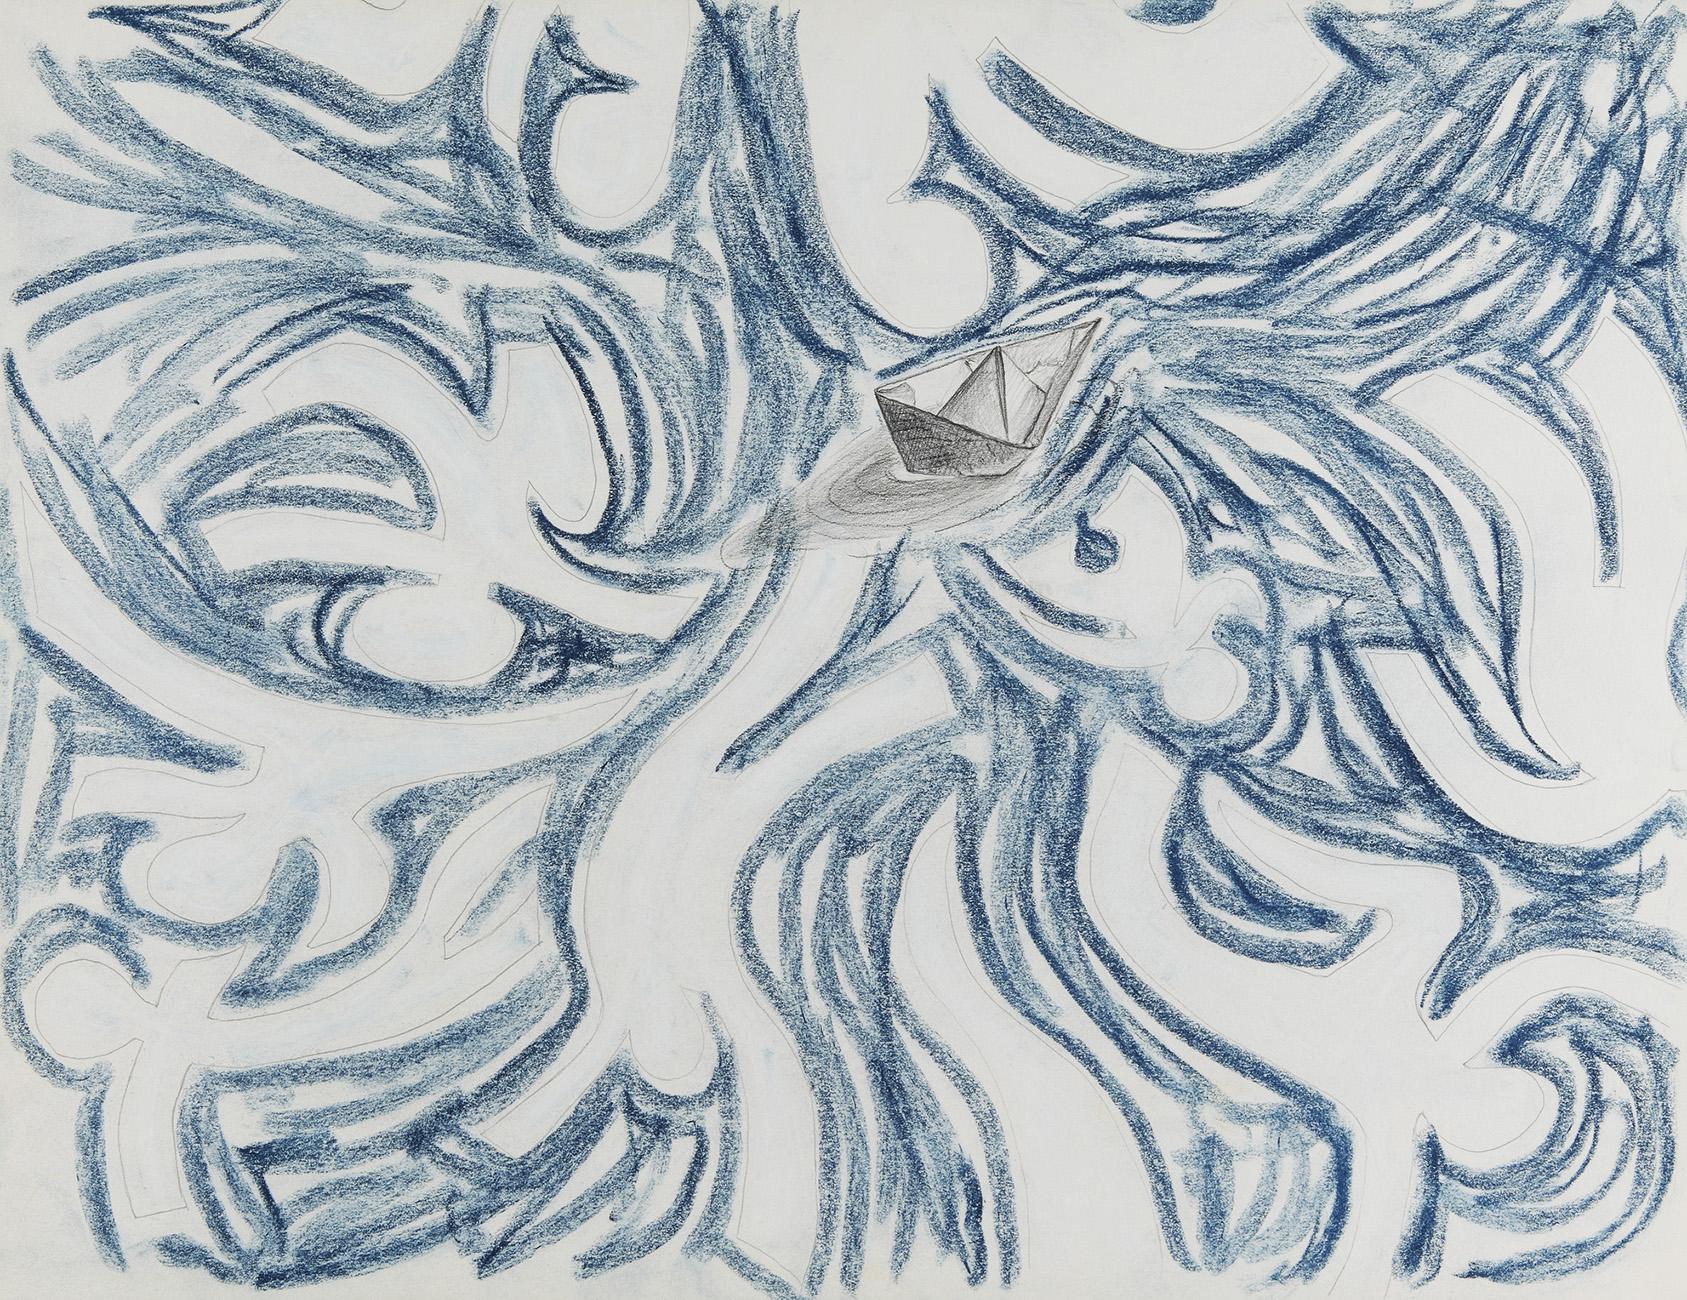 Stromen - potlood & pastelkrijt - 50x70cm - €450